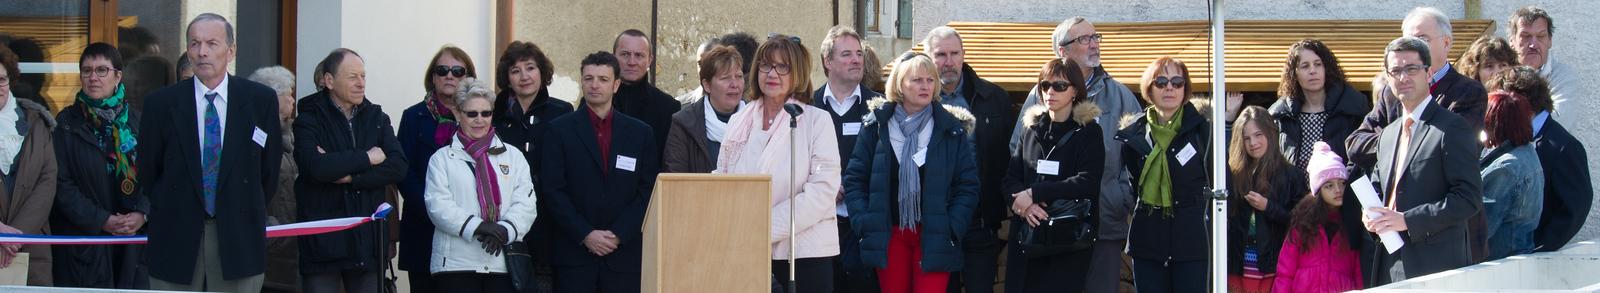 Inauguration 2015